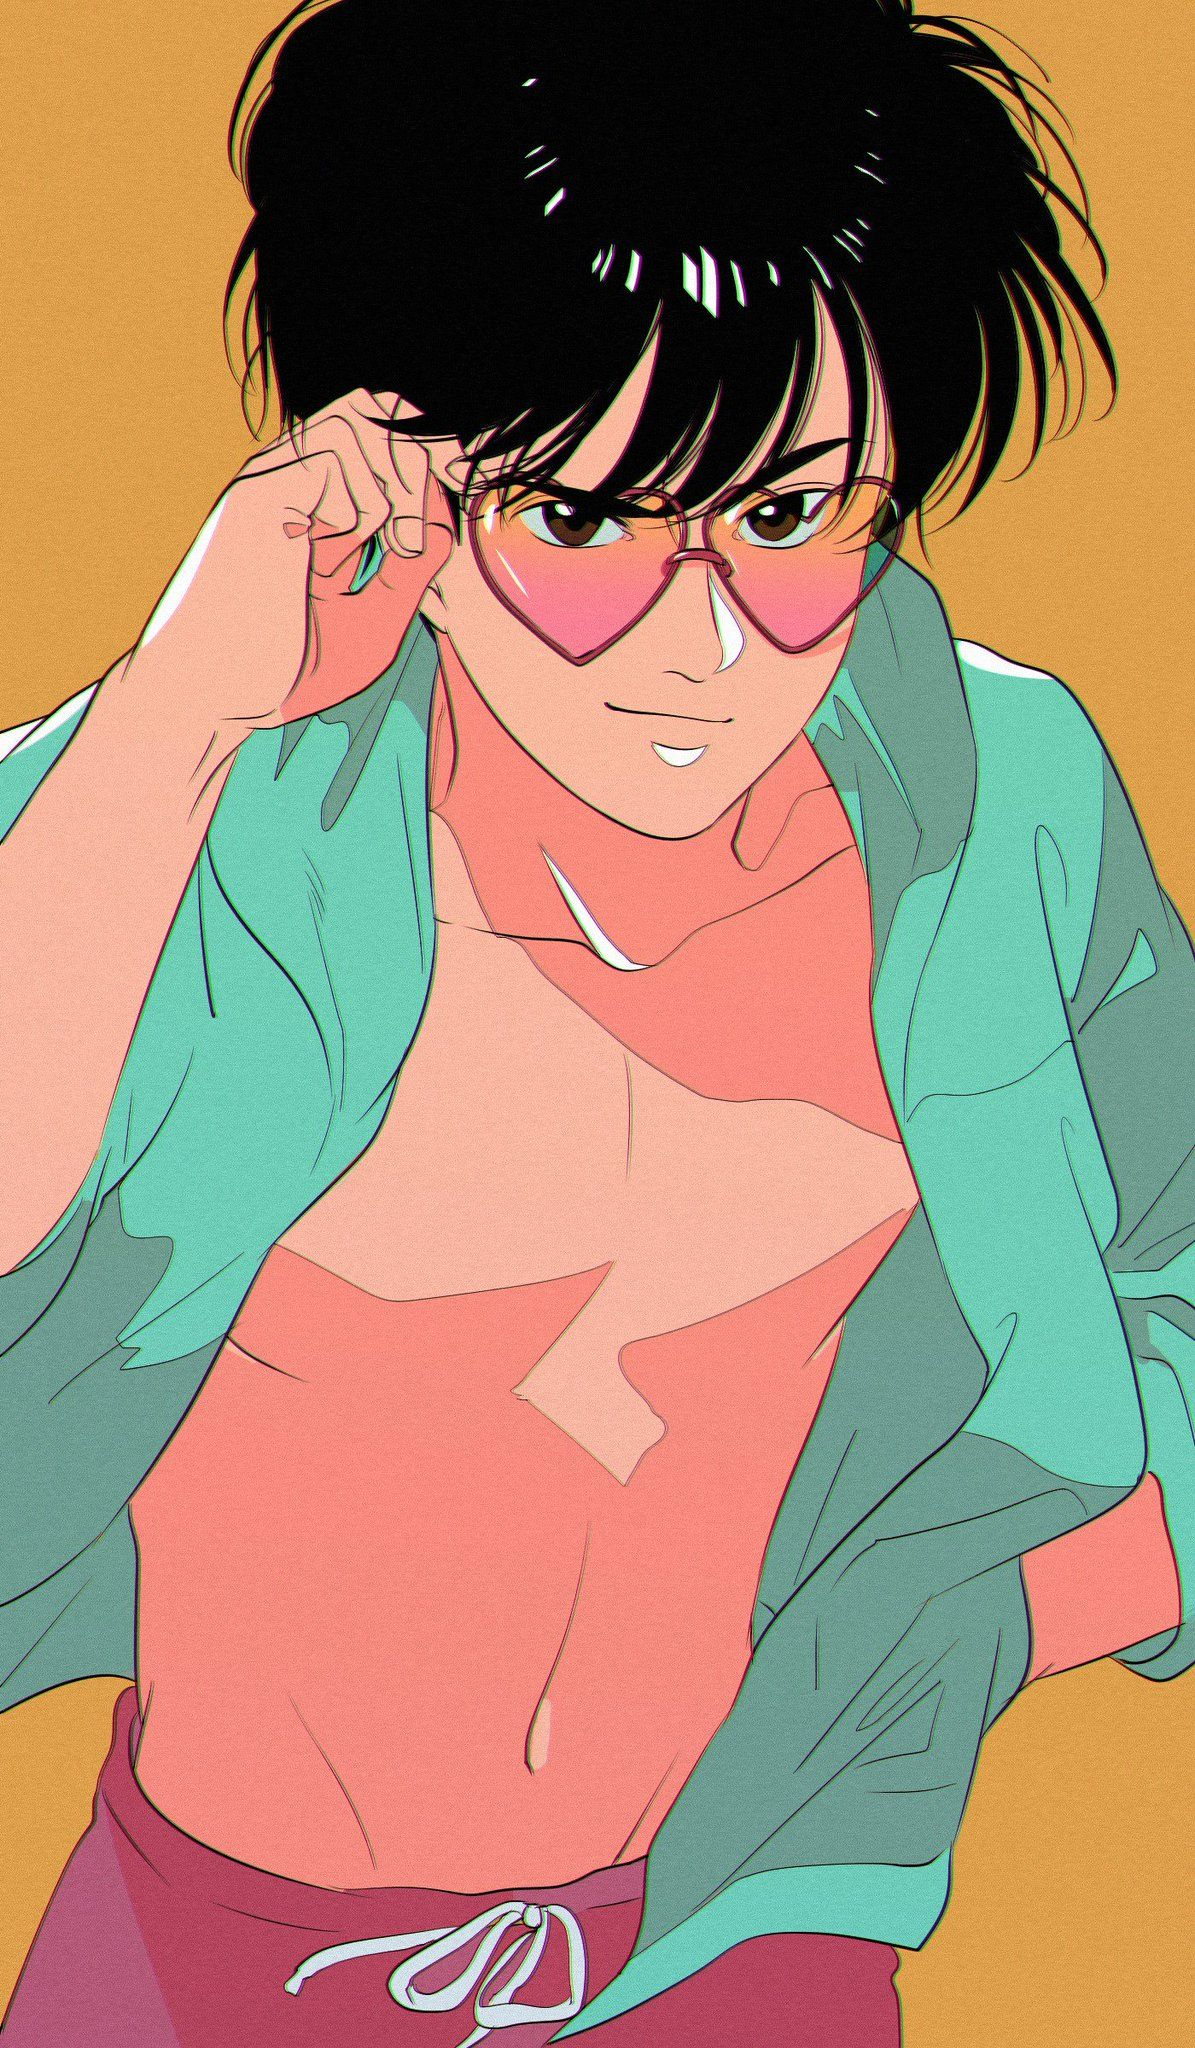 Yasuko on Twitter